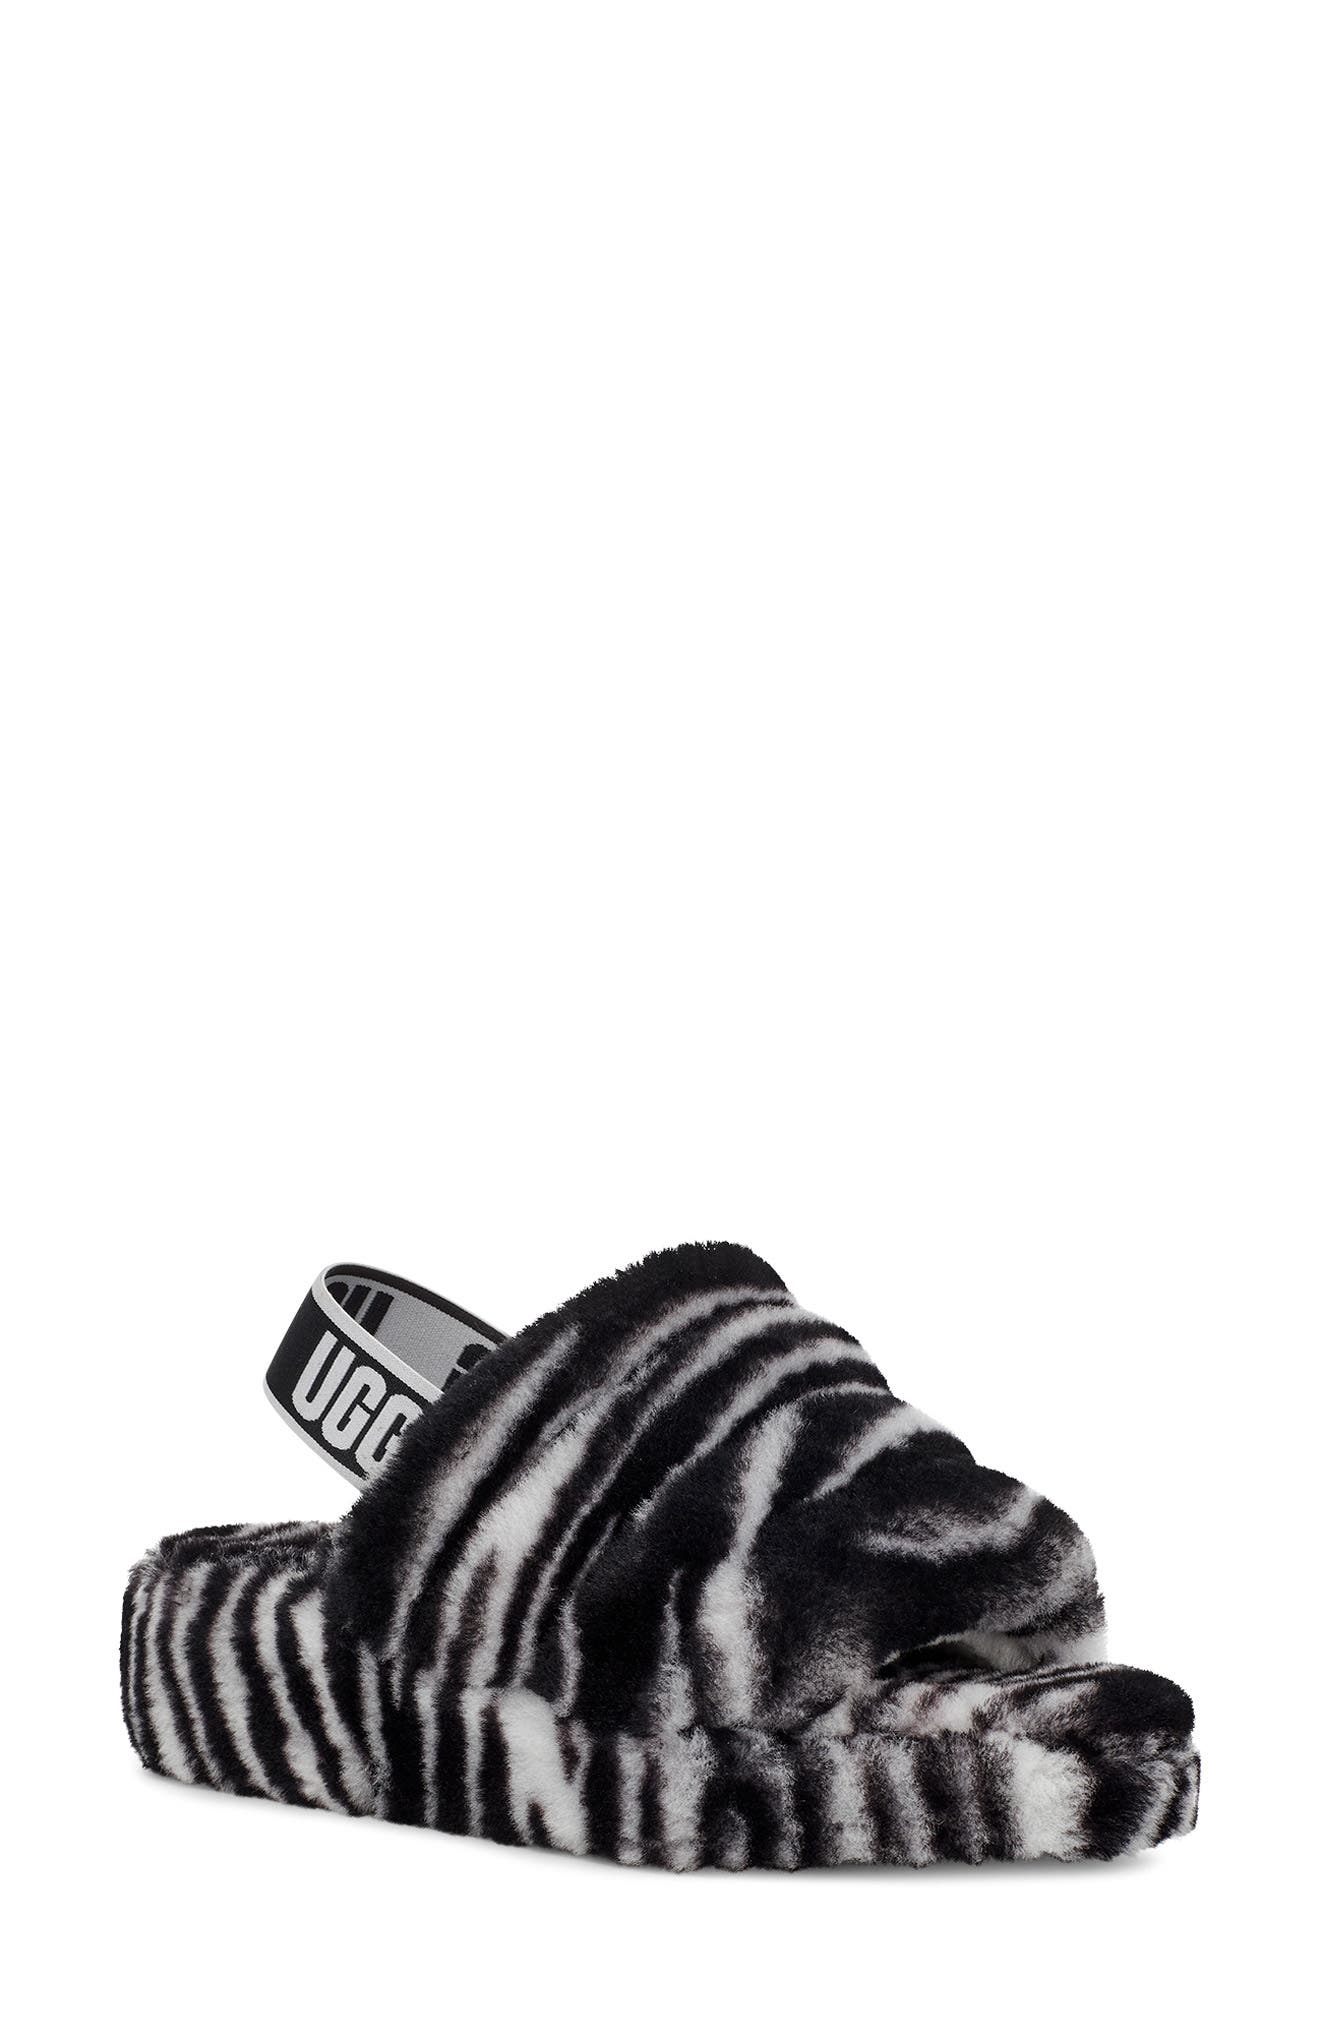 Women's Black Mules \u0026 Slides | Nordstrom